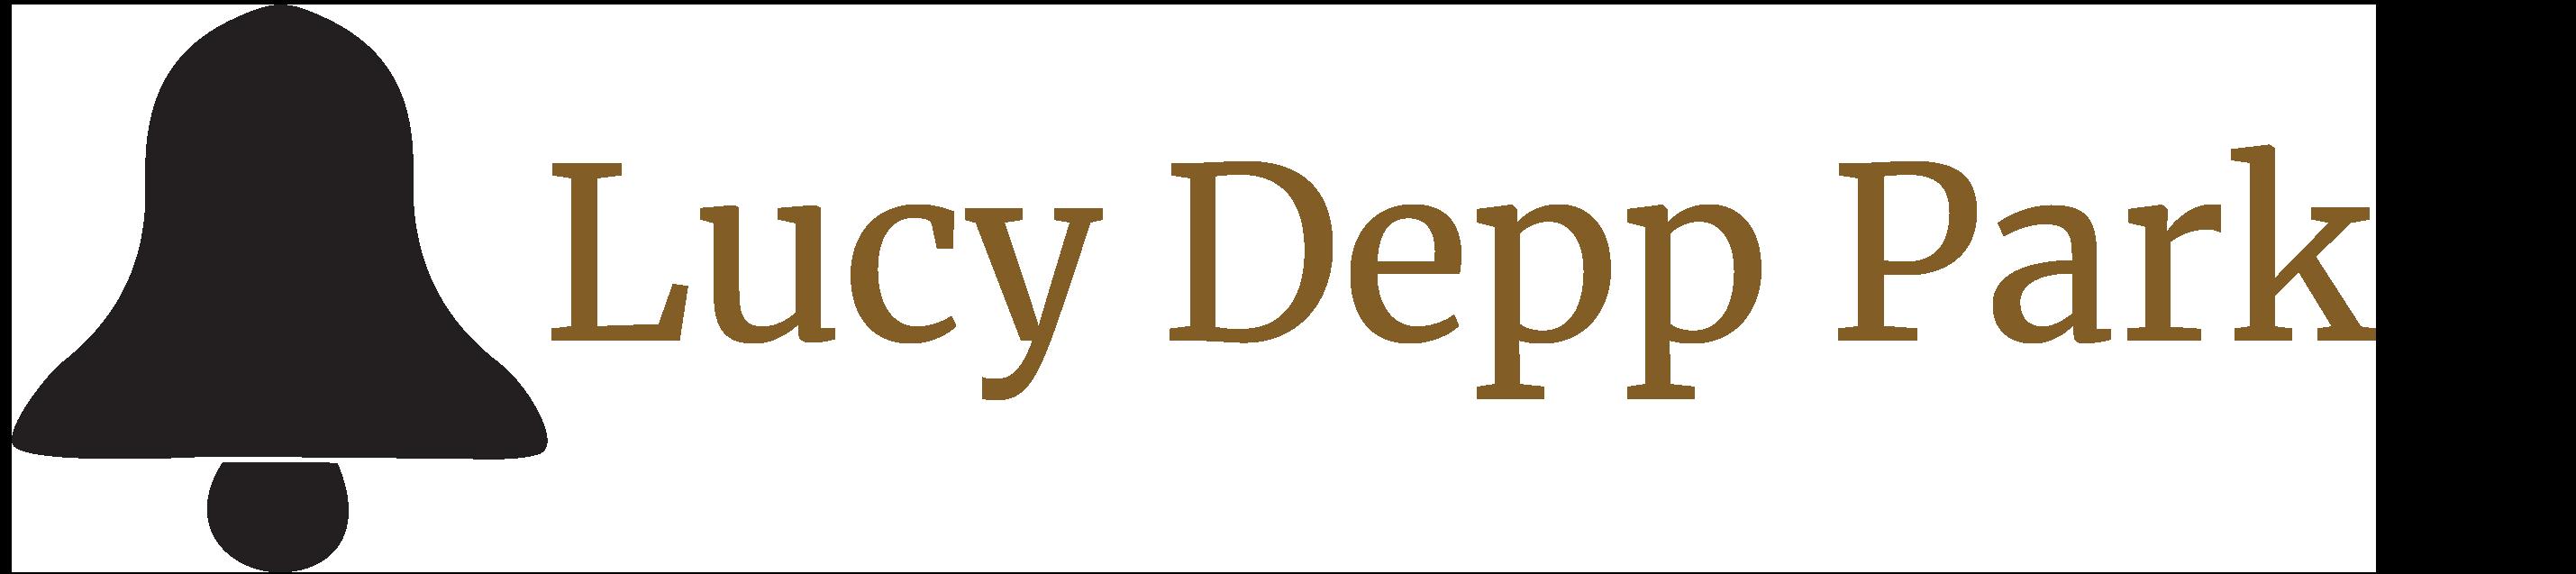 Lucy Depp Park